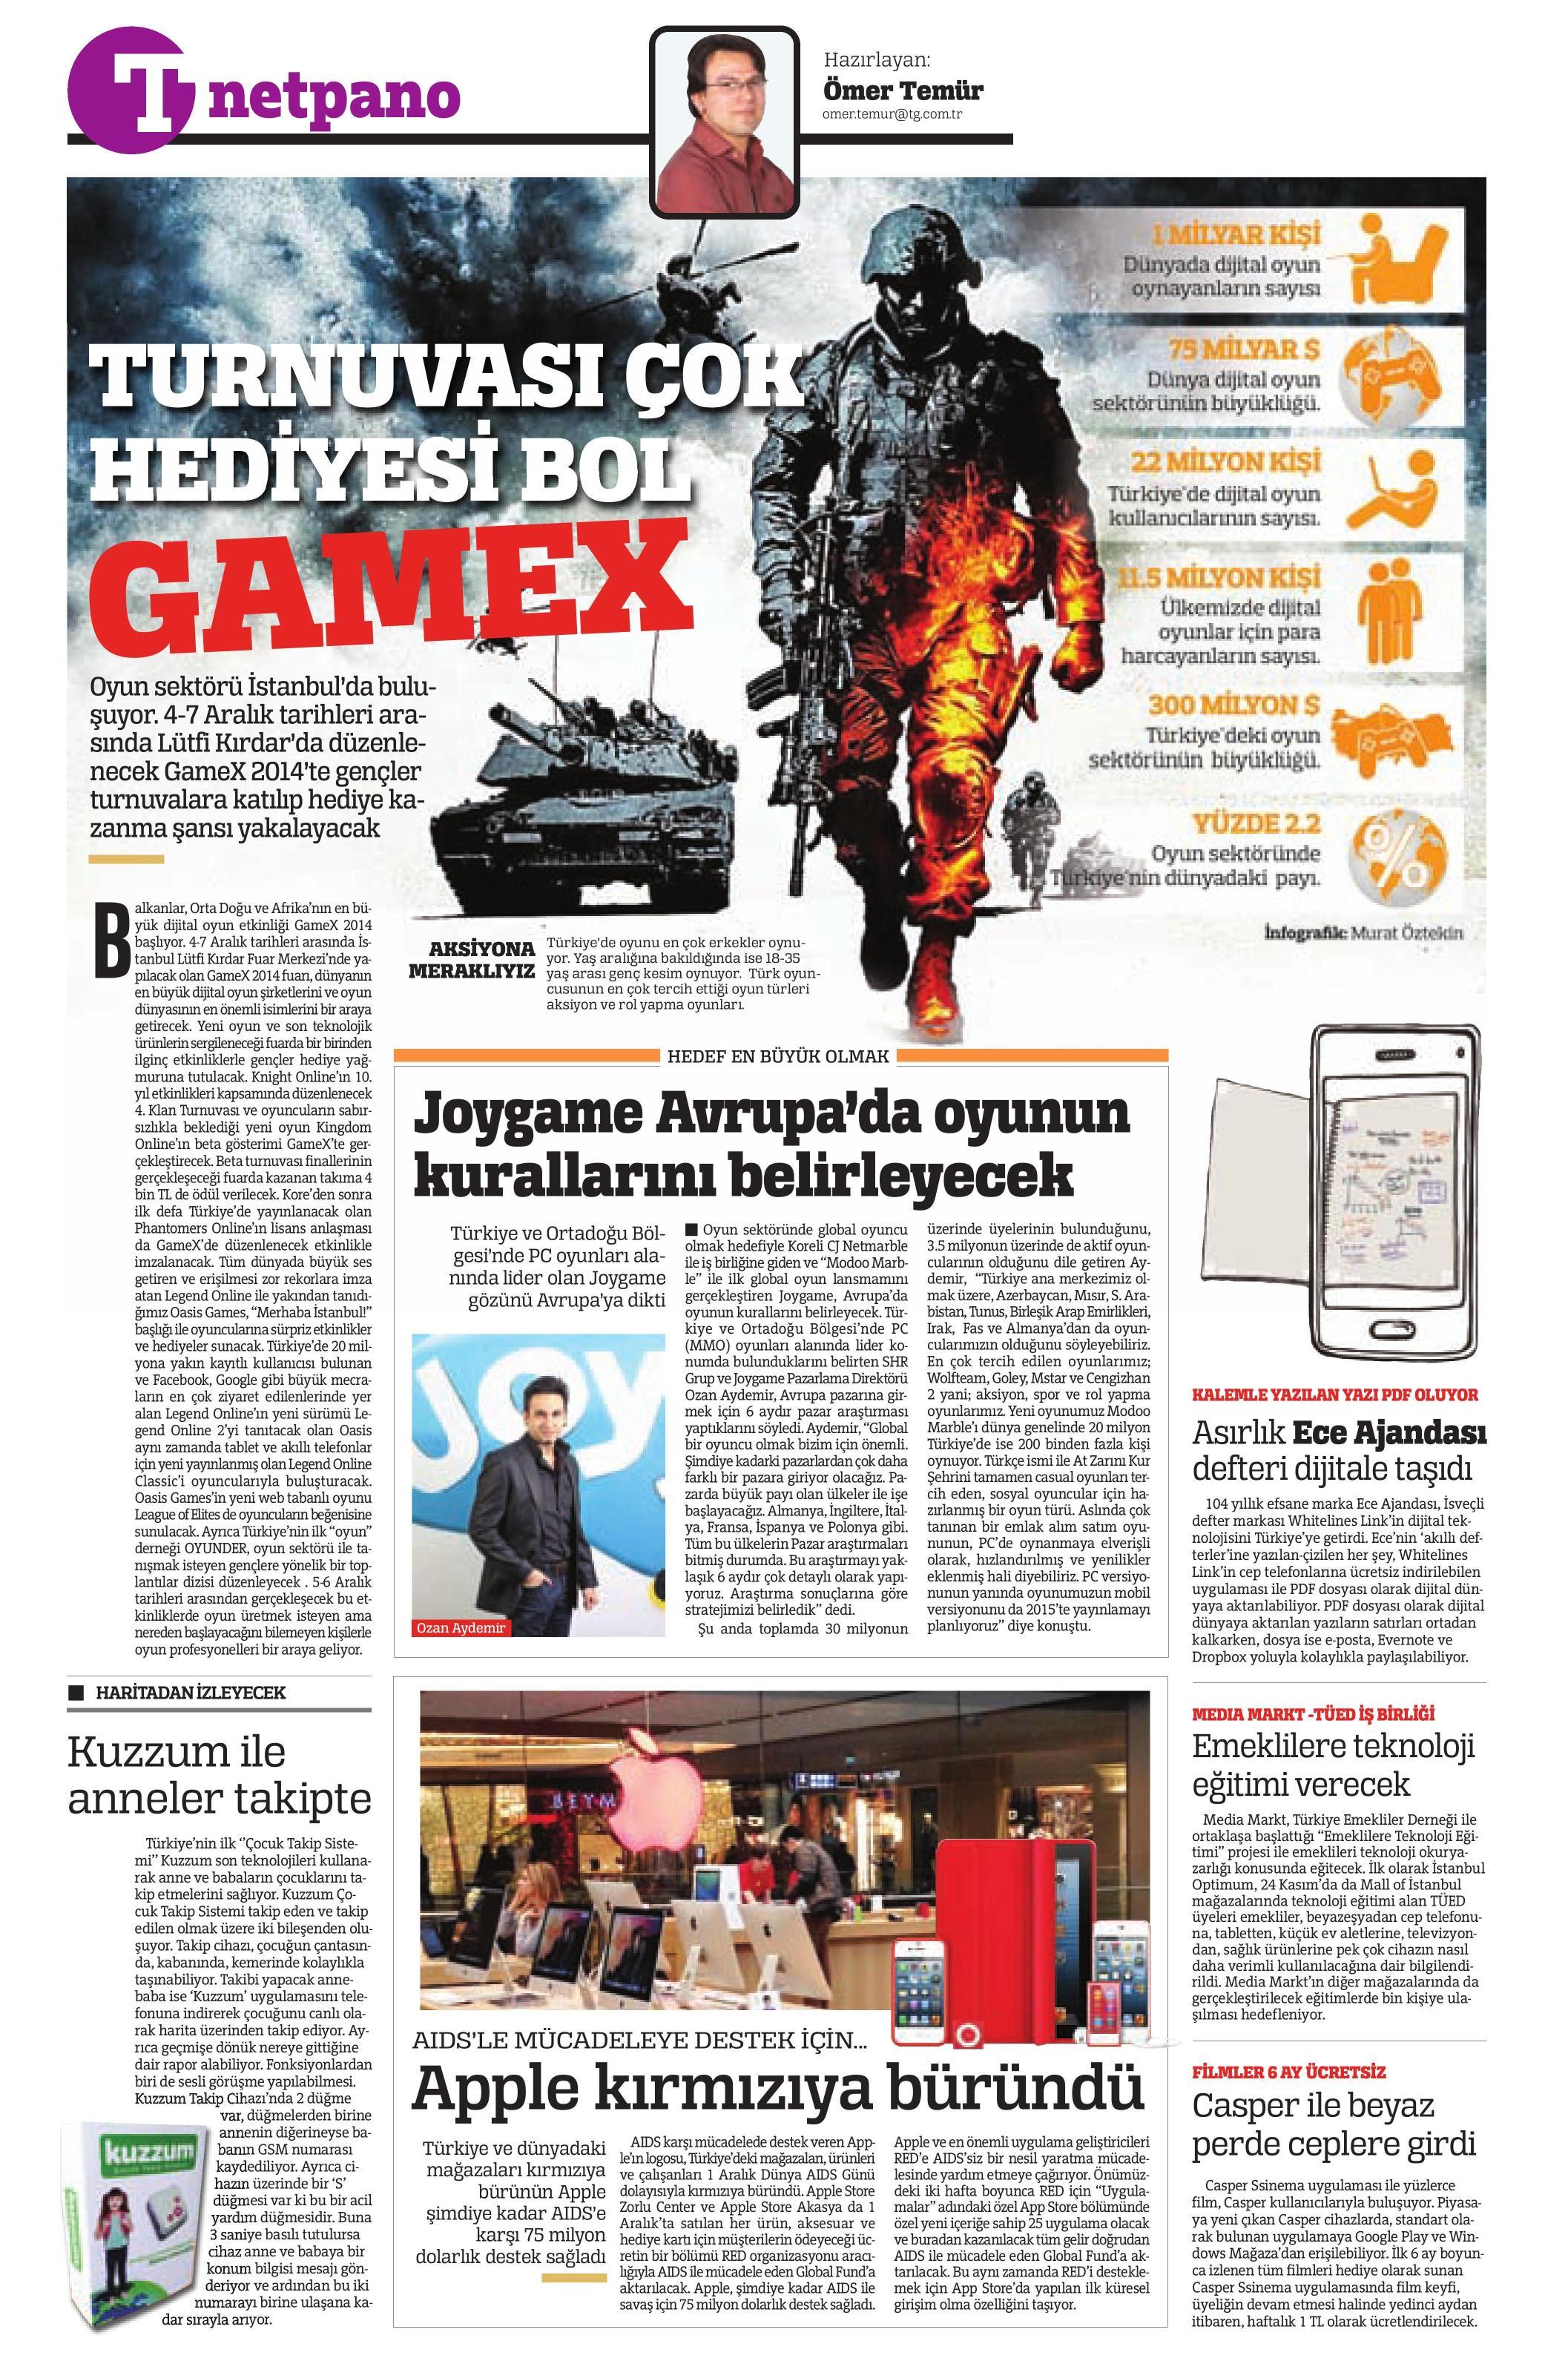 Netmarble-Turkey-Turkiye-Sayfa-6-02.12.14